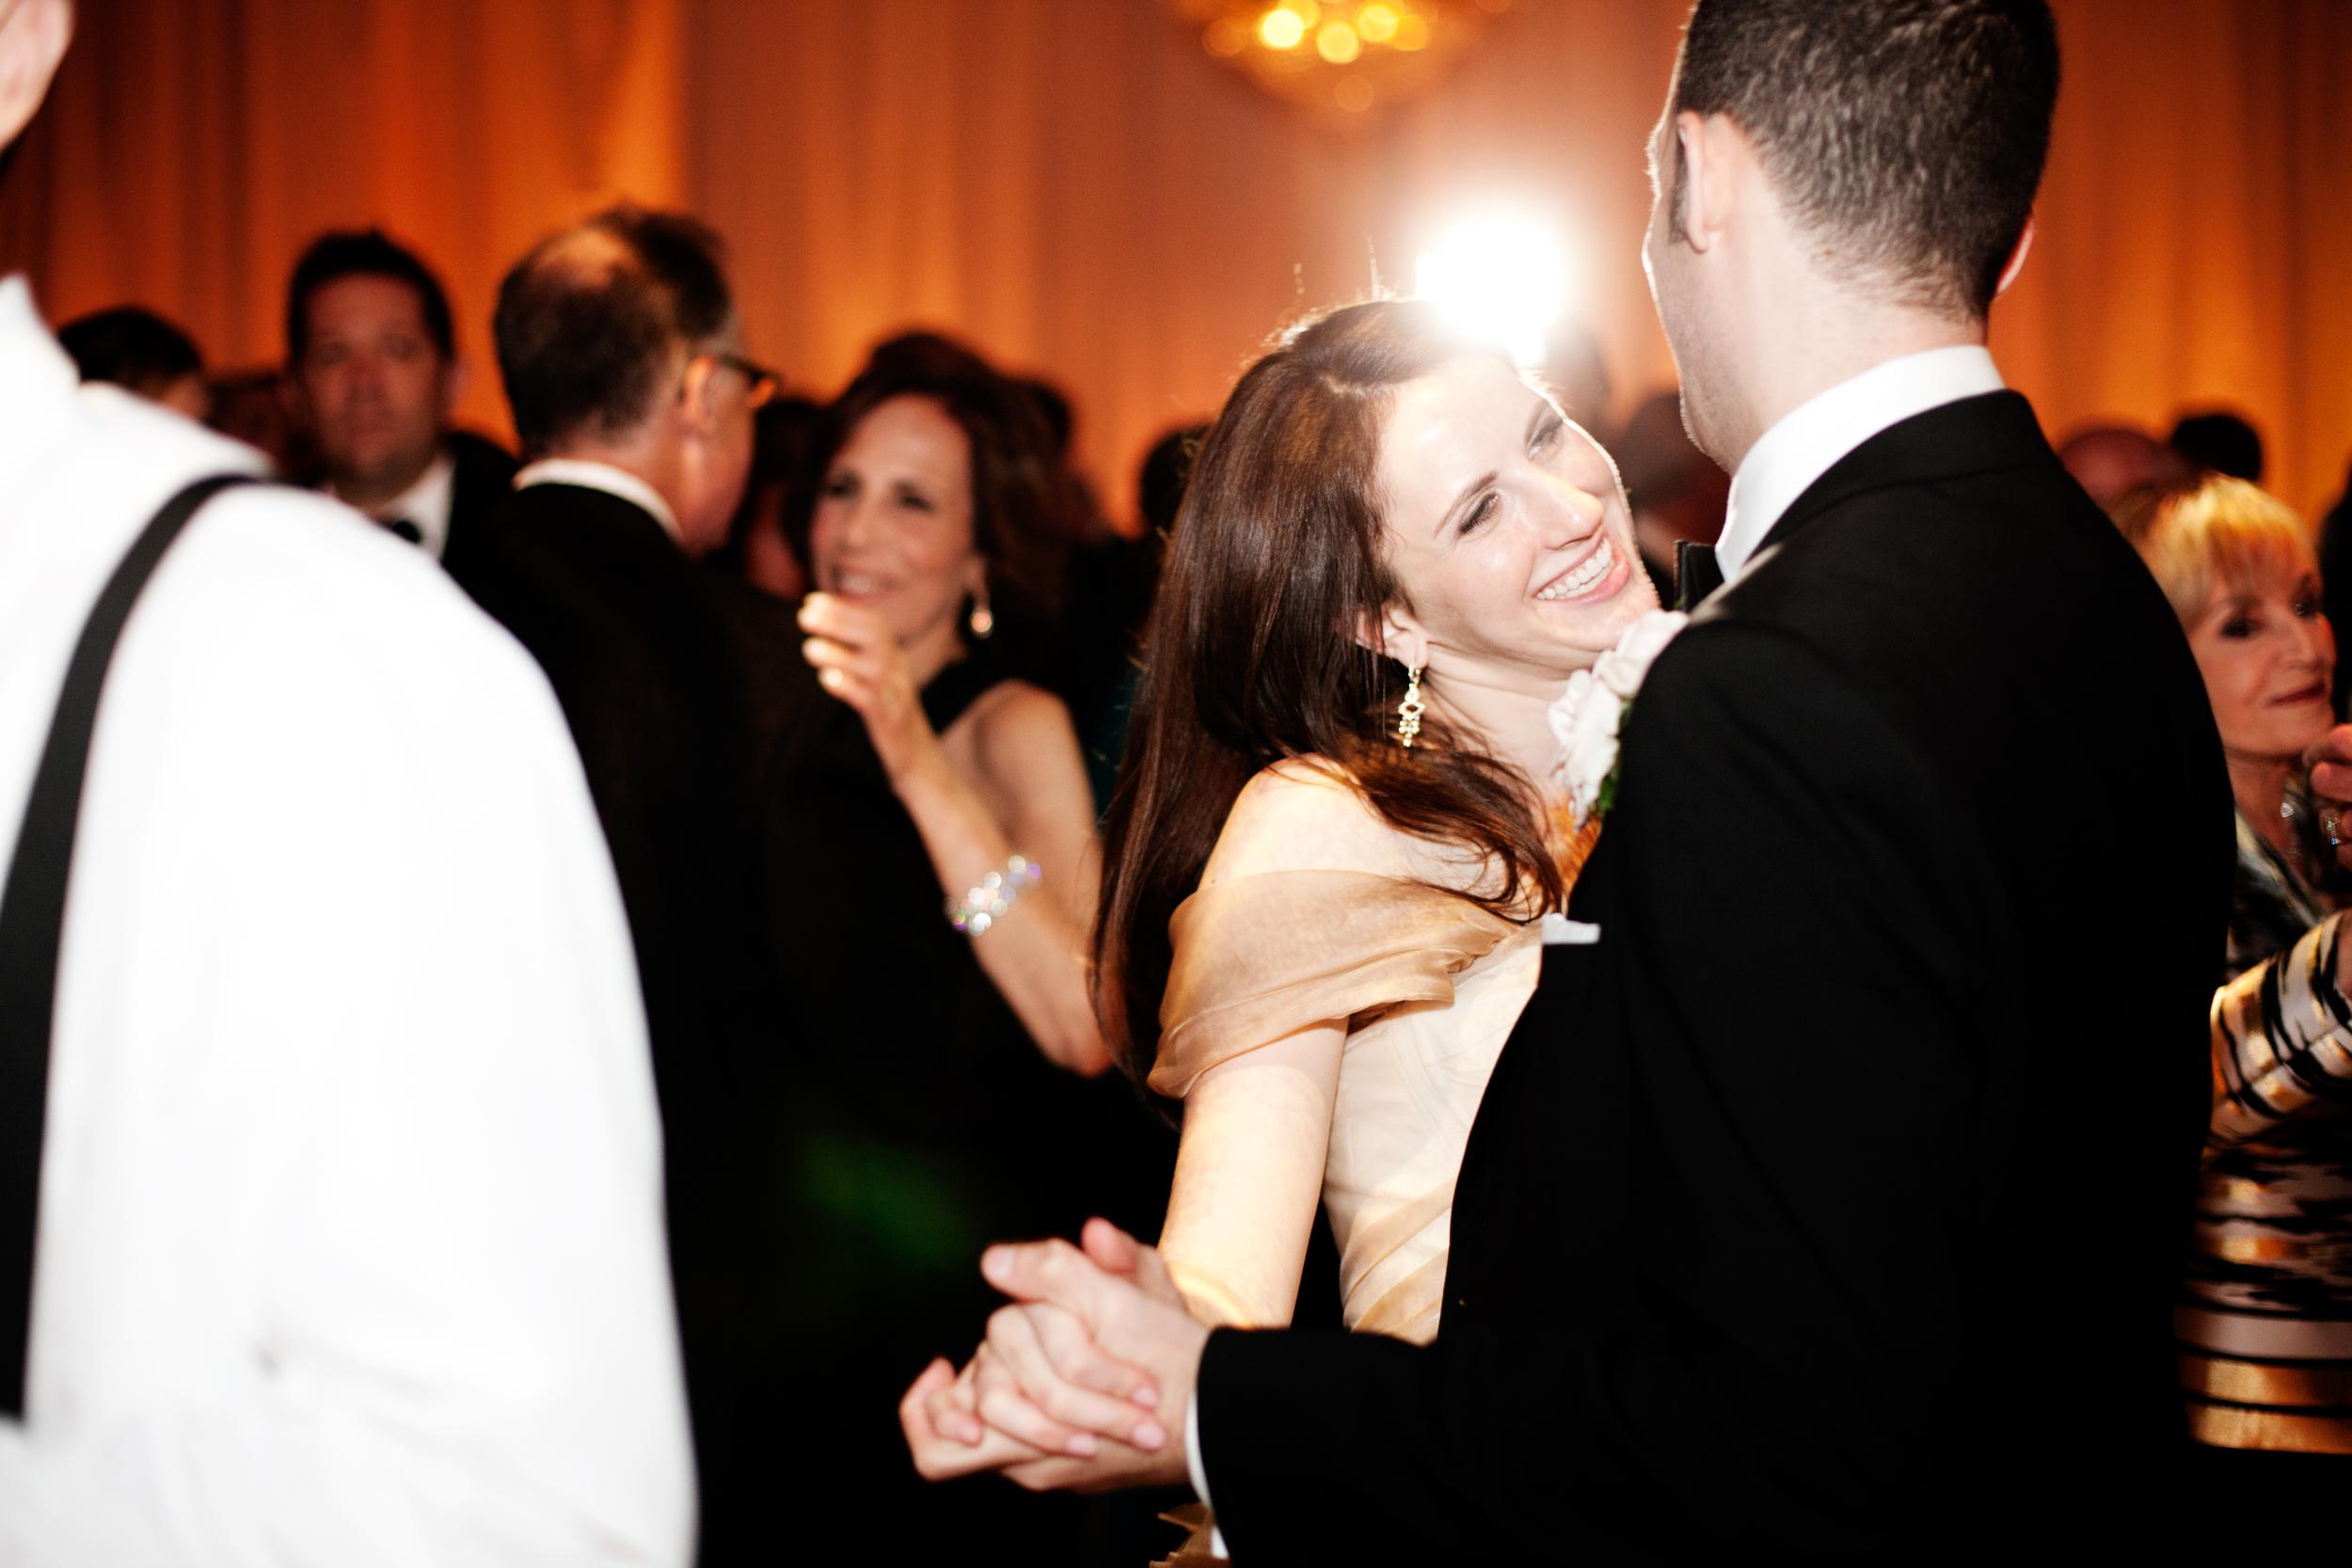 Ceci_New_York_Ceci_Style_Ceci_Johnson_Luxury_Lifestyle_Floral_Lace_Wedding_Letterpress_Inspiration_Design_Custom_Couture_Personalized_Invitations_-132.jpg